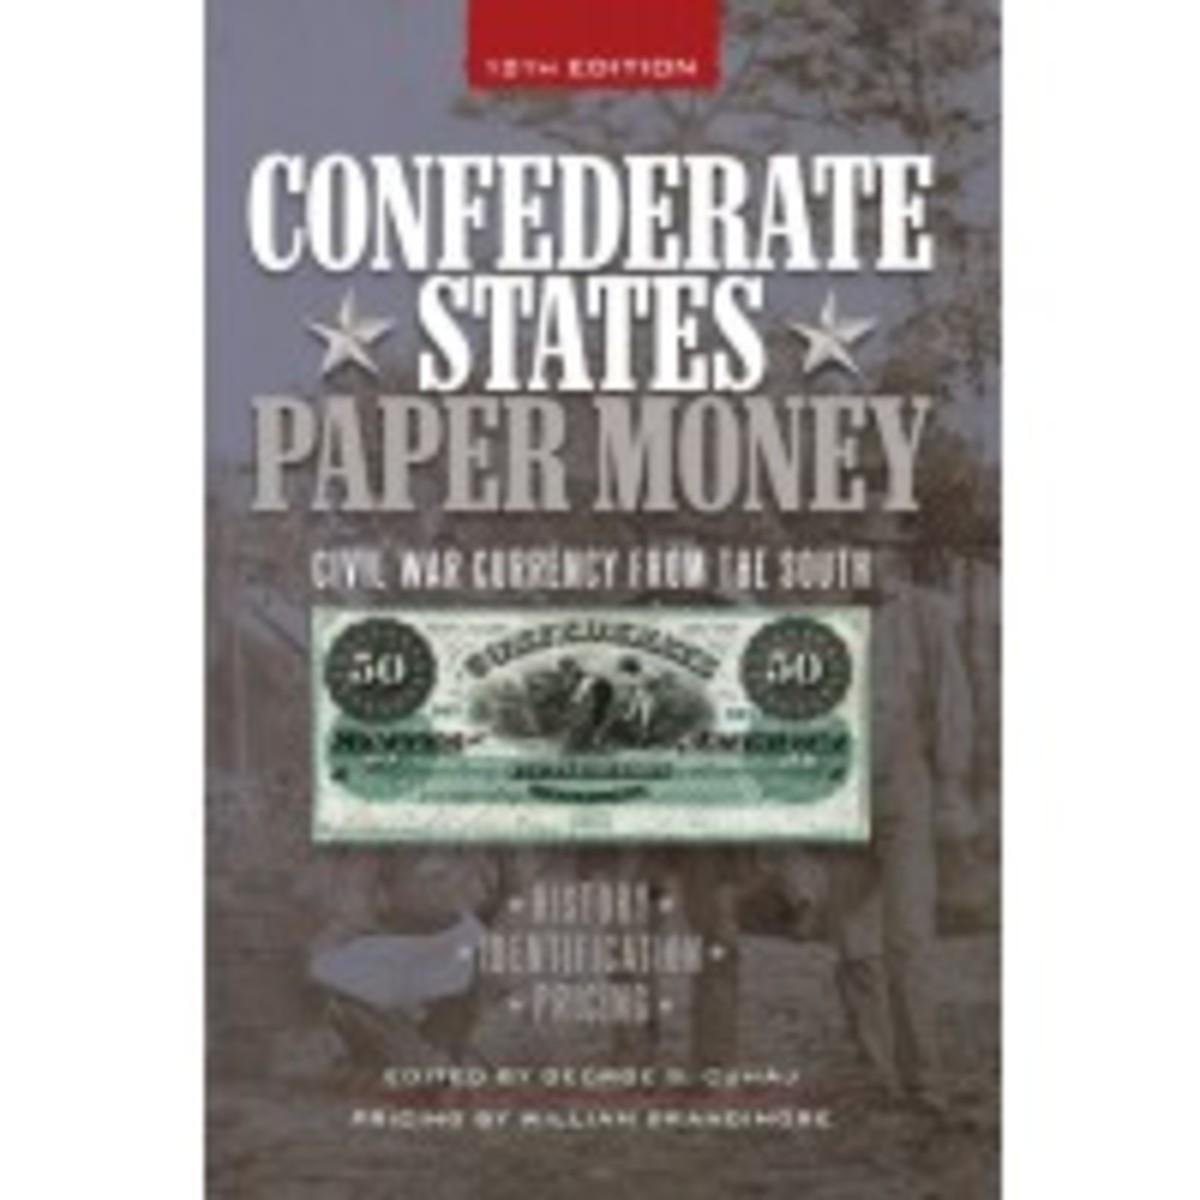 Confederate States Paper Money, 12th Edition